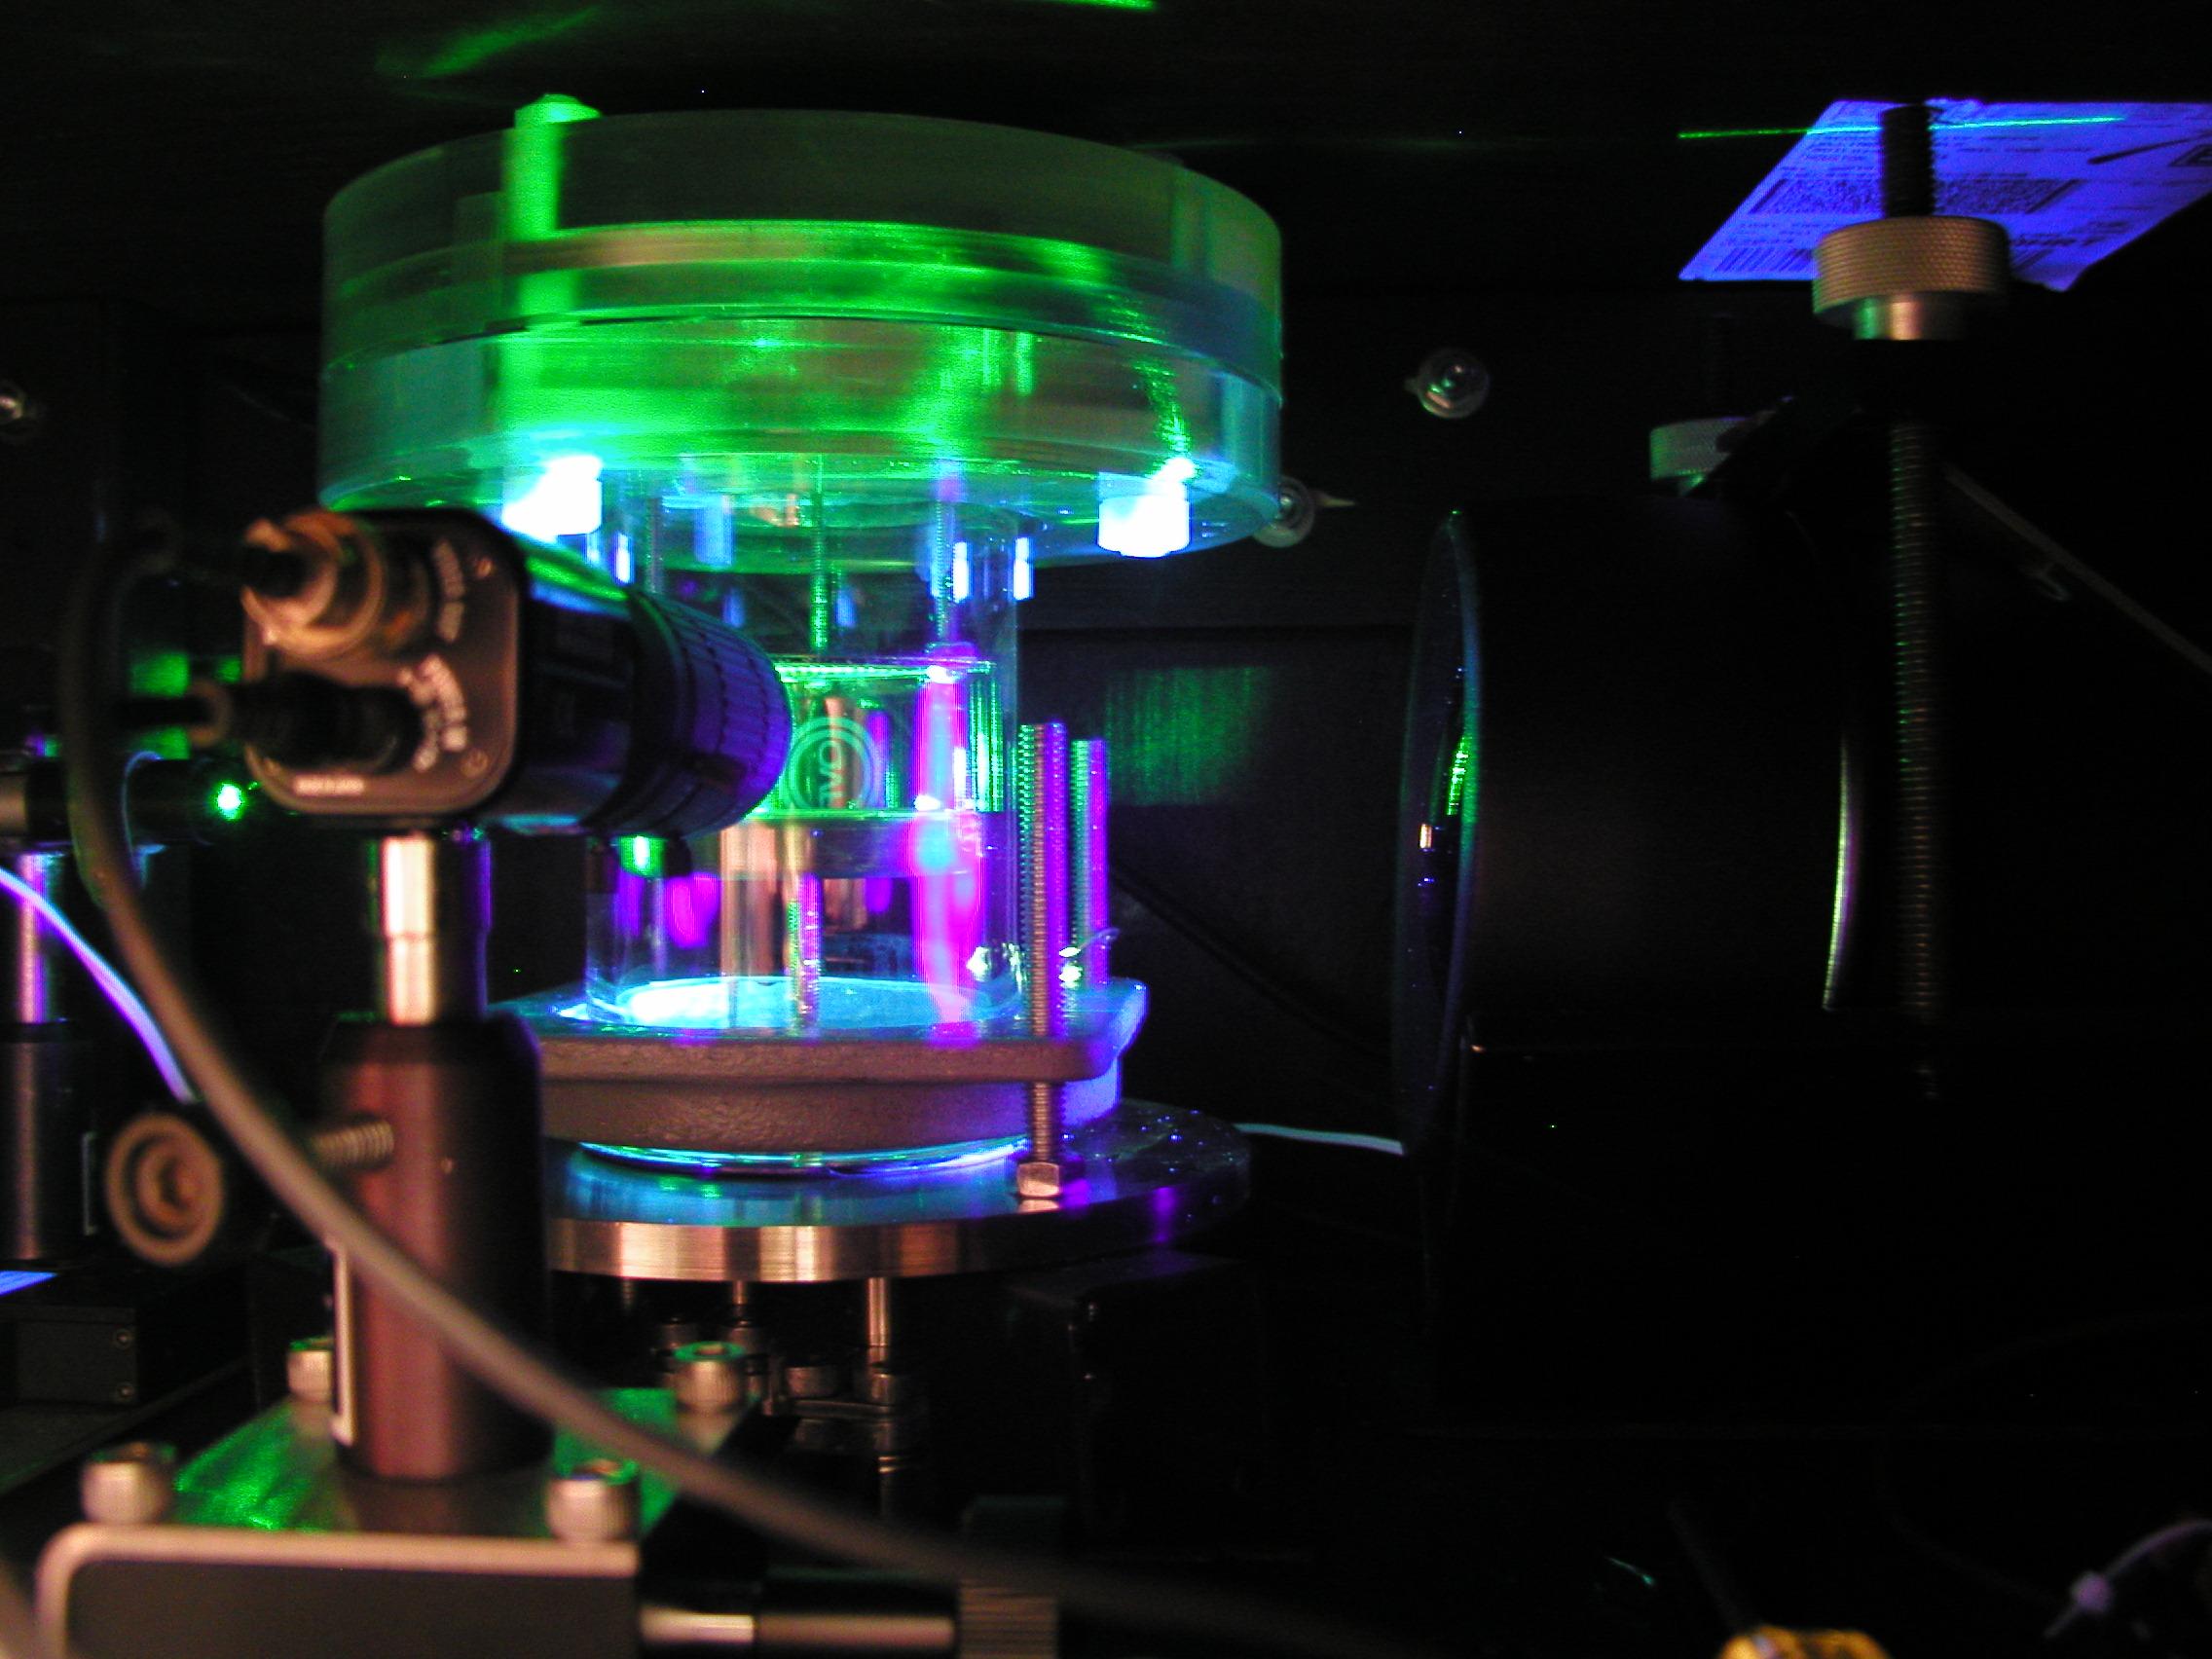 micrograv chamber